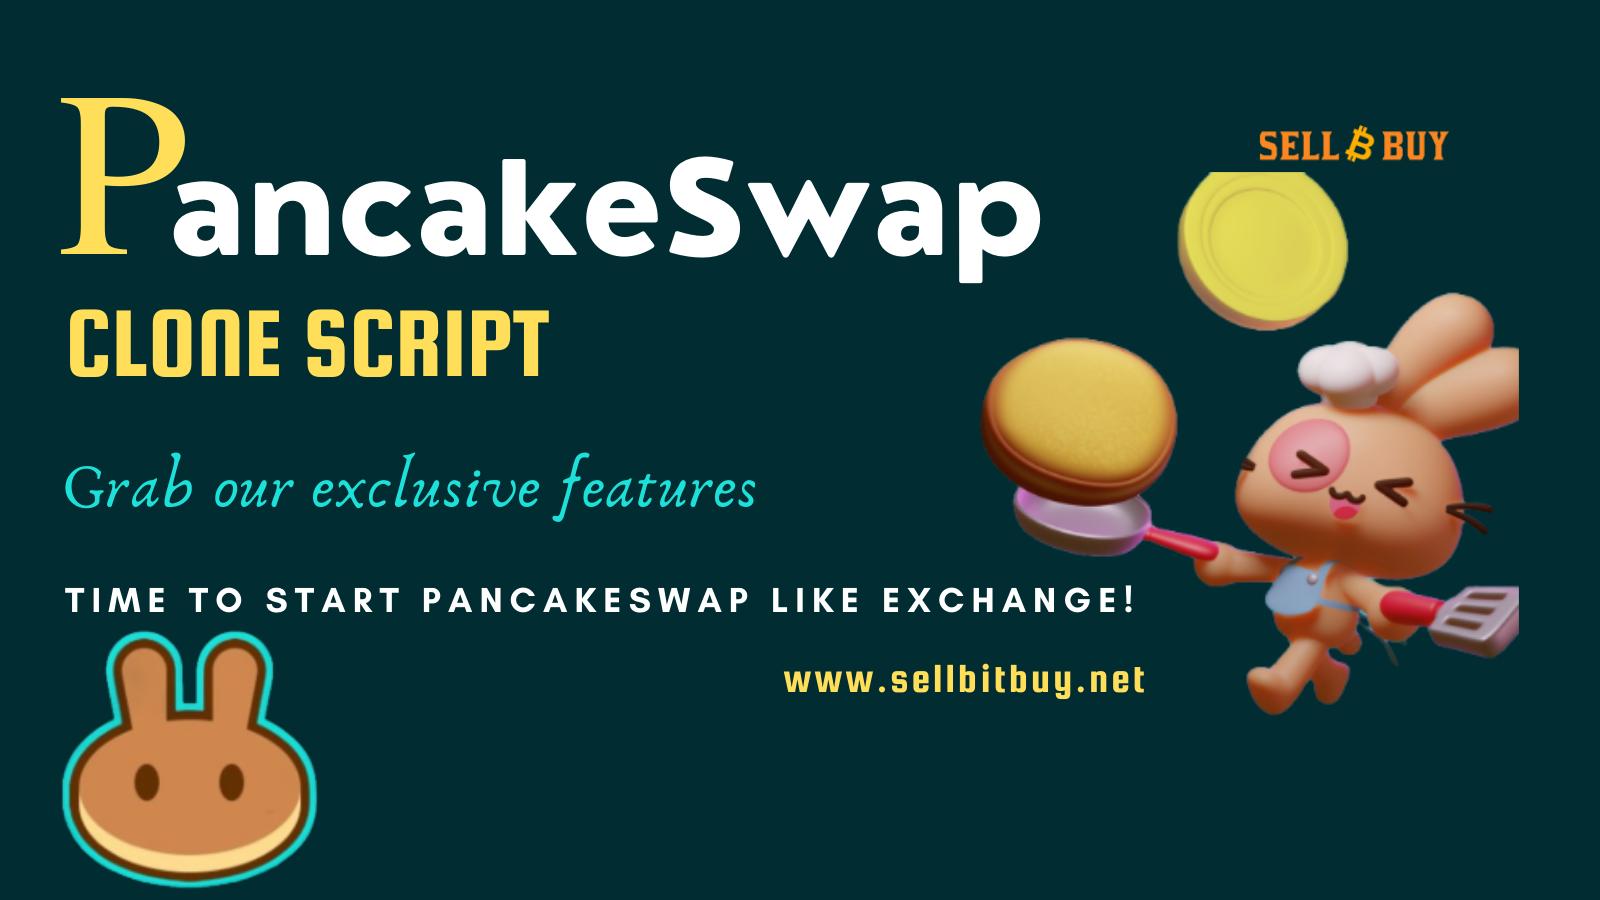 Low Cost pancakeswap clone script | Unstoppable PancakeSwap like DEX development Services On Ethereum Blockchain